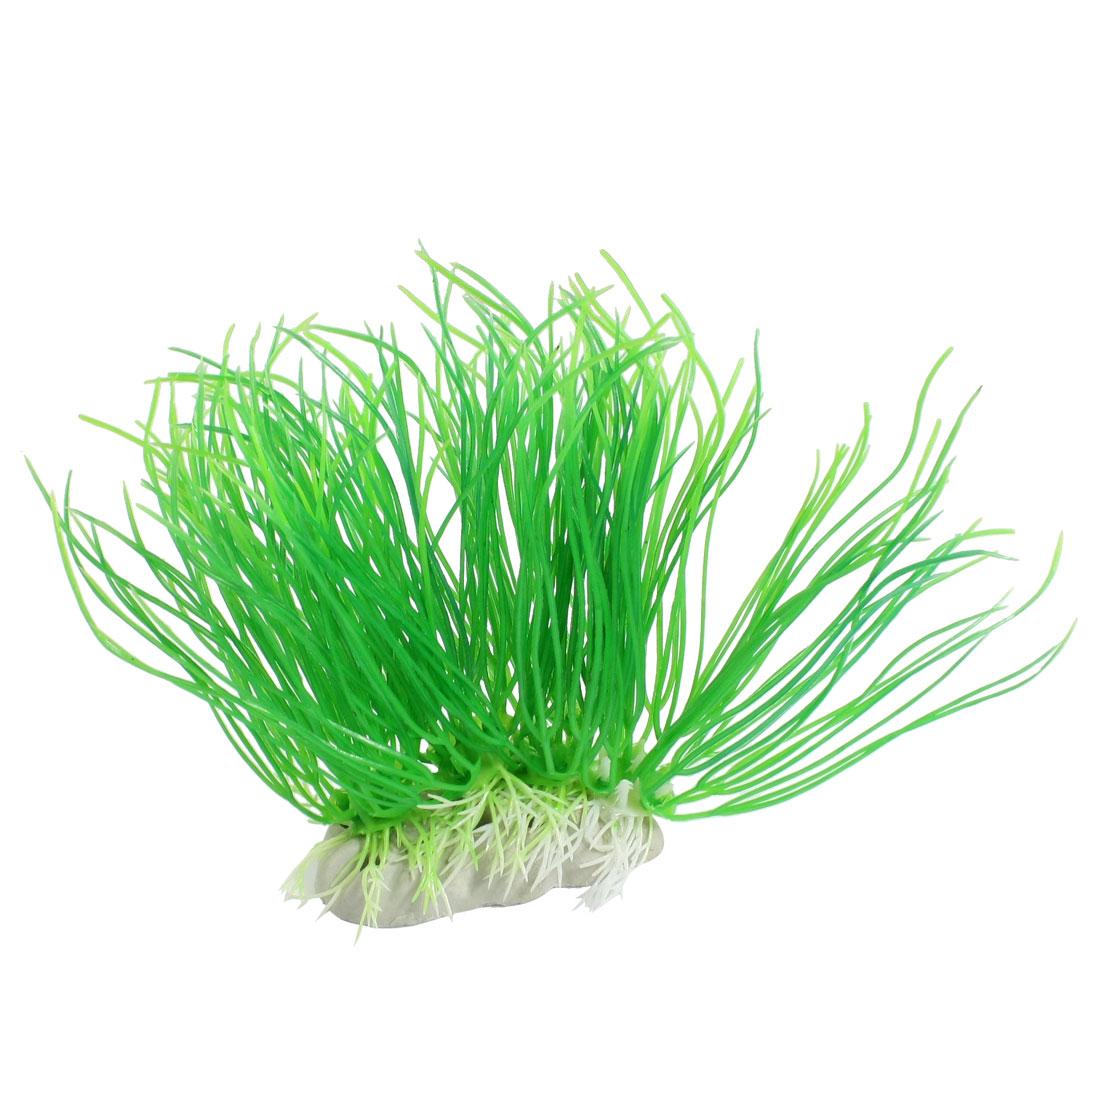 "Green Emulational Underwater Grass Decoration 4.5"" Height for Aquarium"